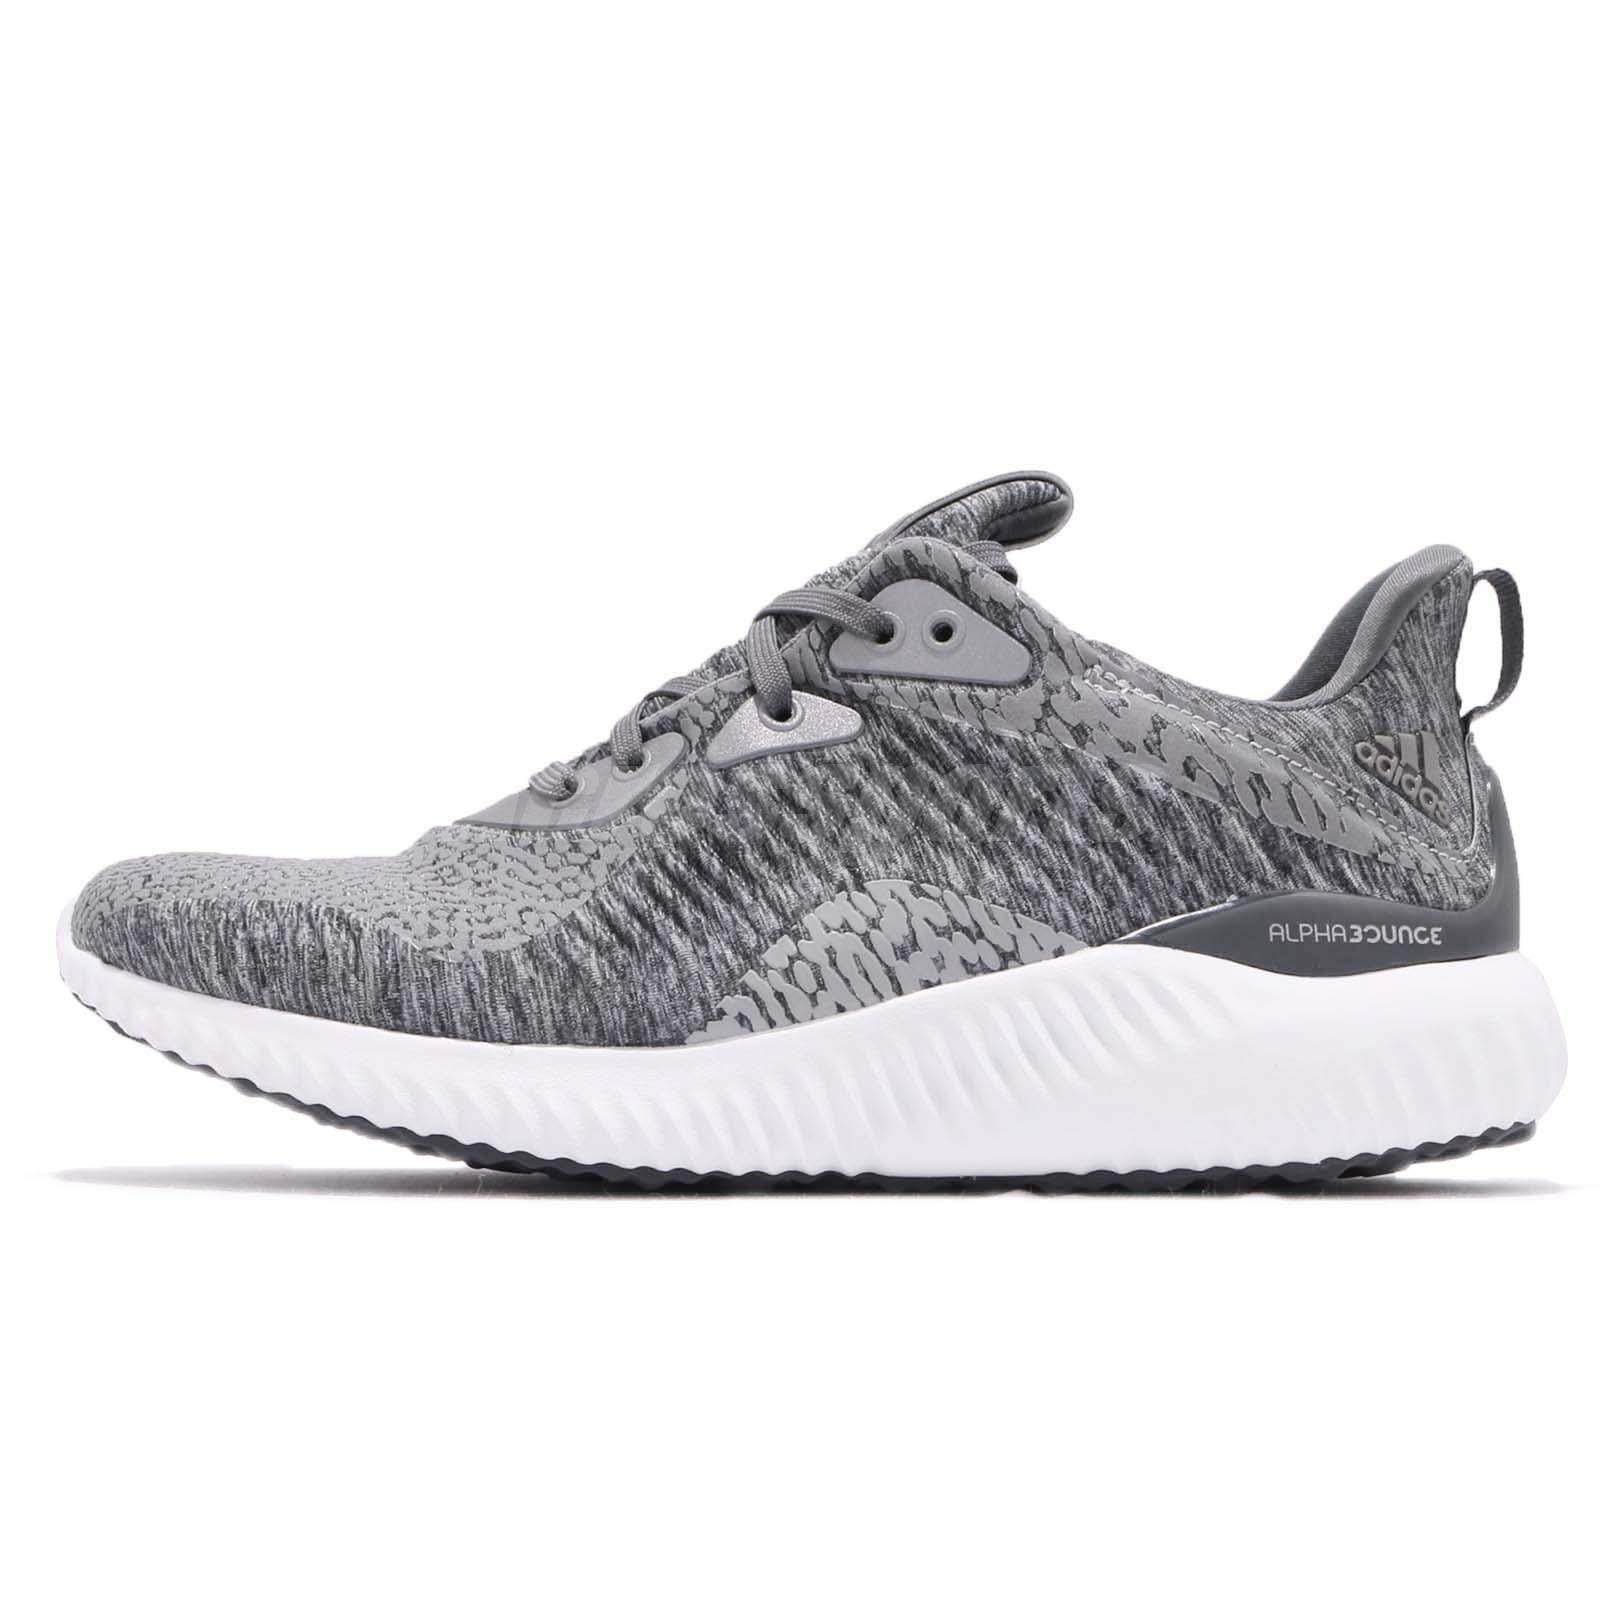 976652a4c adidas Alphabounce HPC AMS W Grey White Women Running Shoes Sneakers DA8708